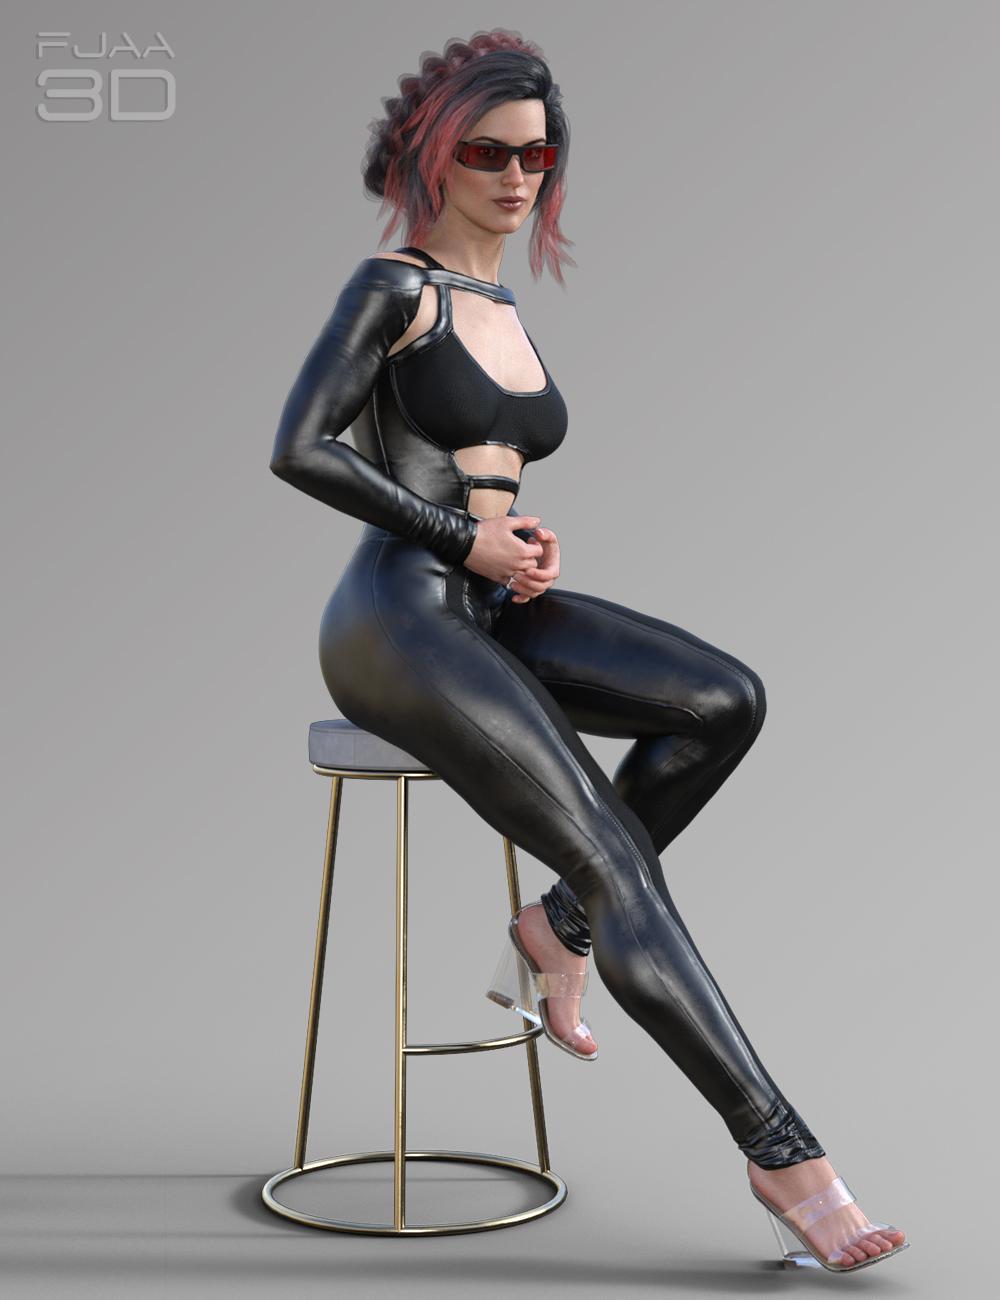 Elegant Skinny Jumpsuit for Genesis 8 Female(s) by: fjaa3d, 3D Models by Daz 3D